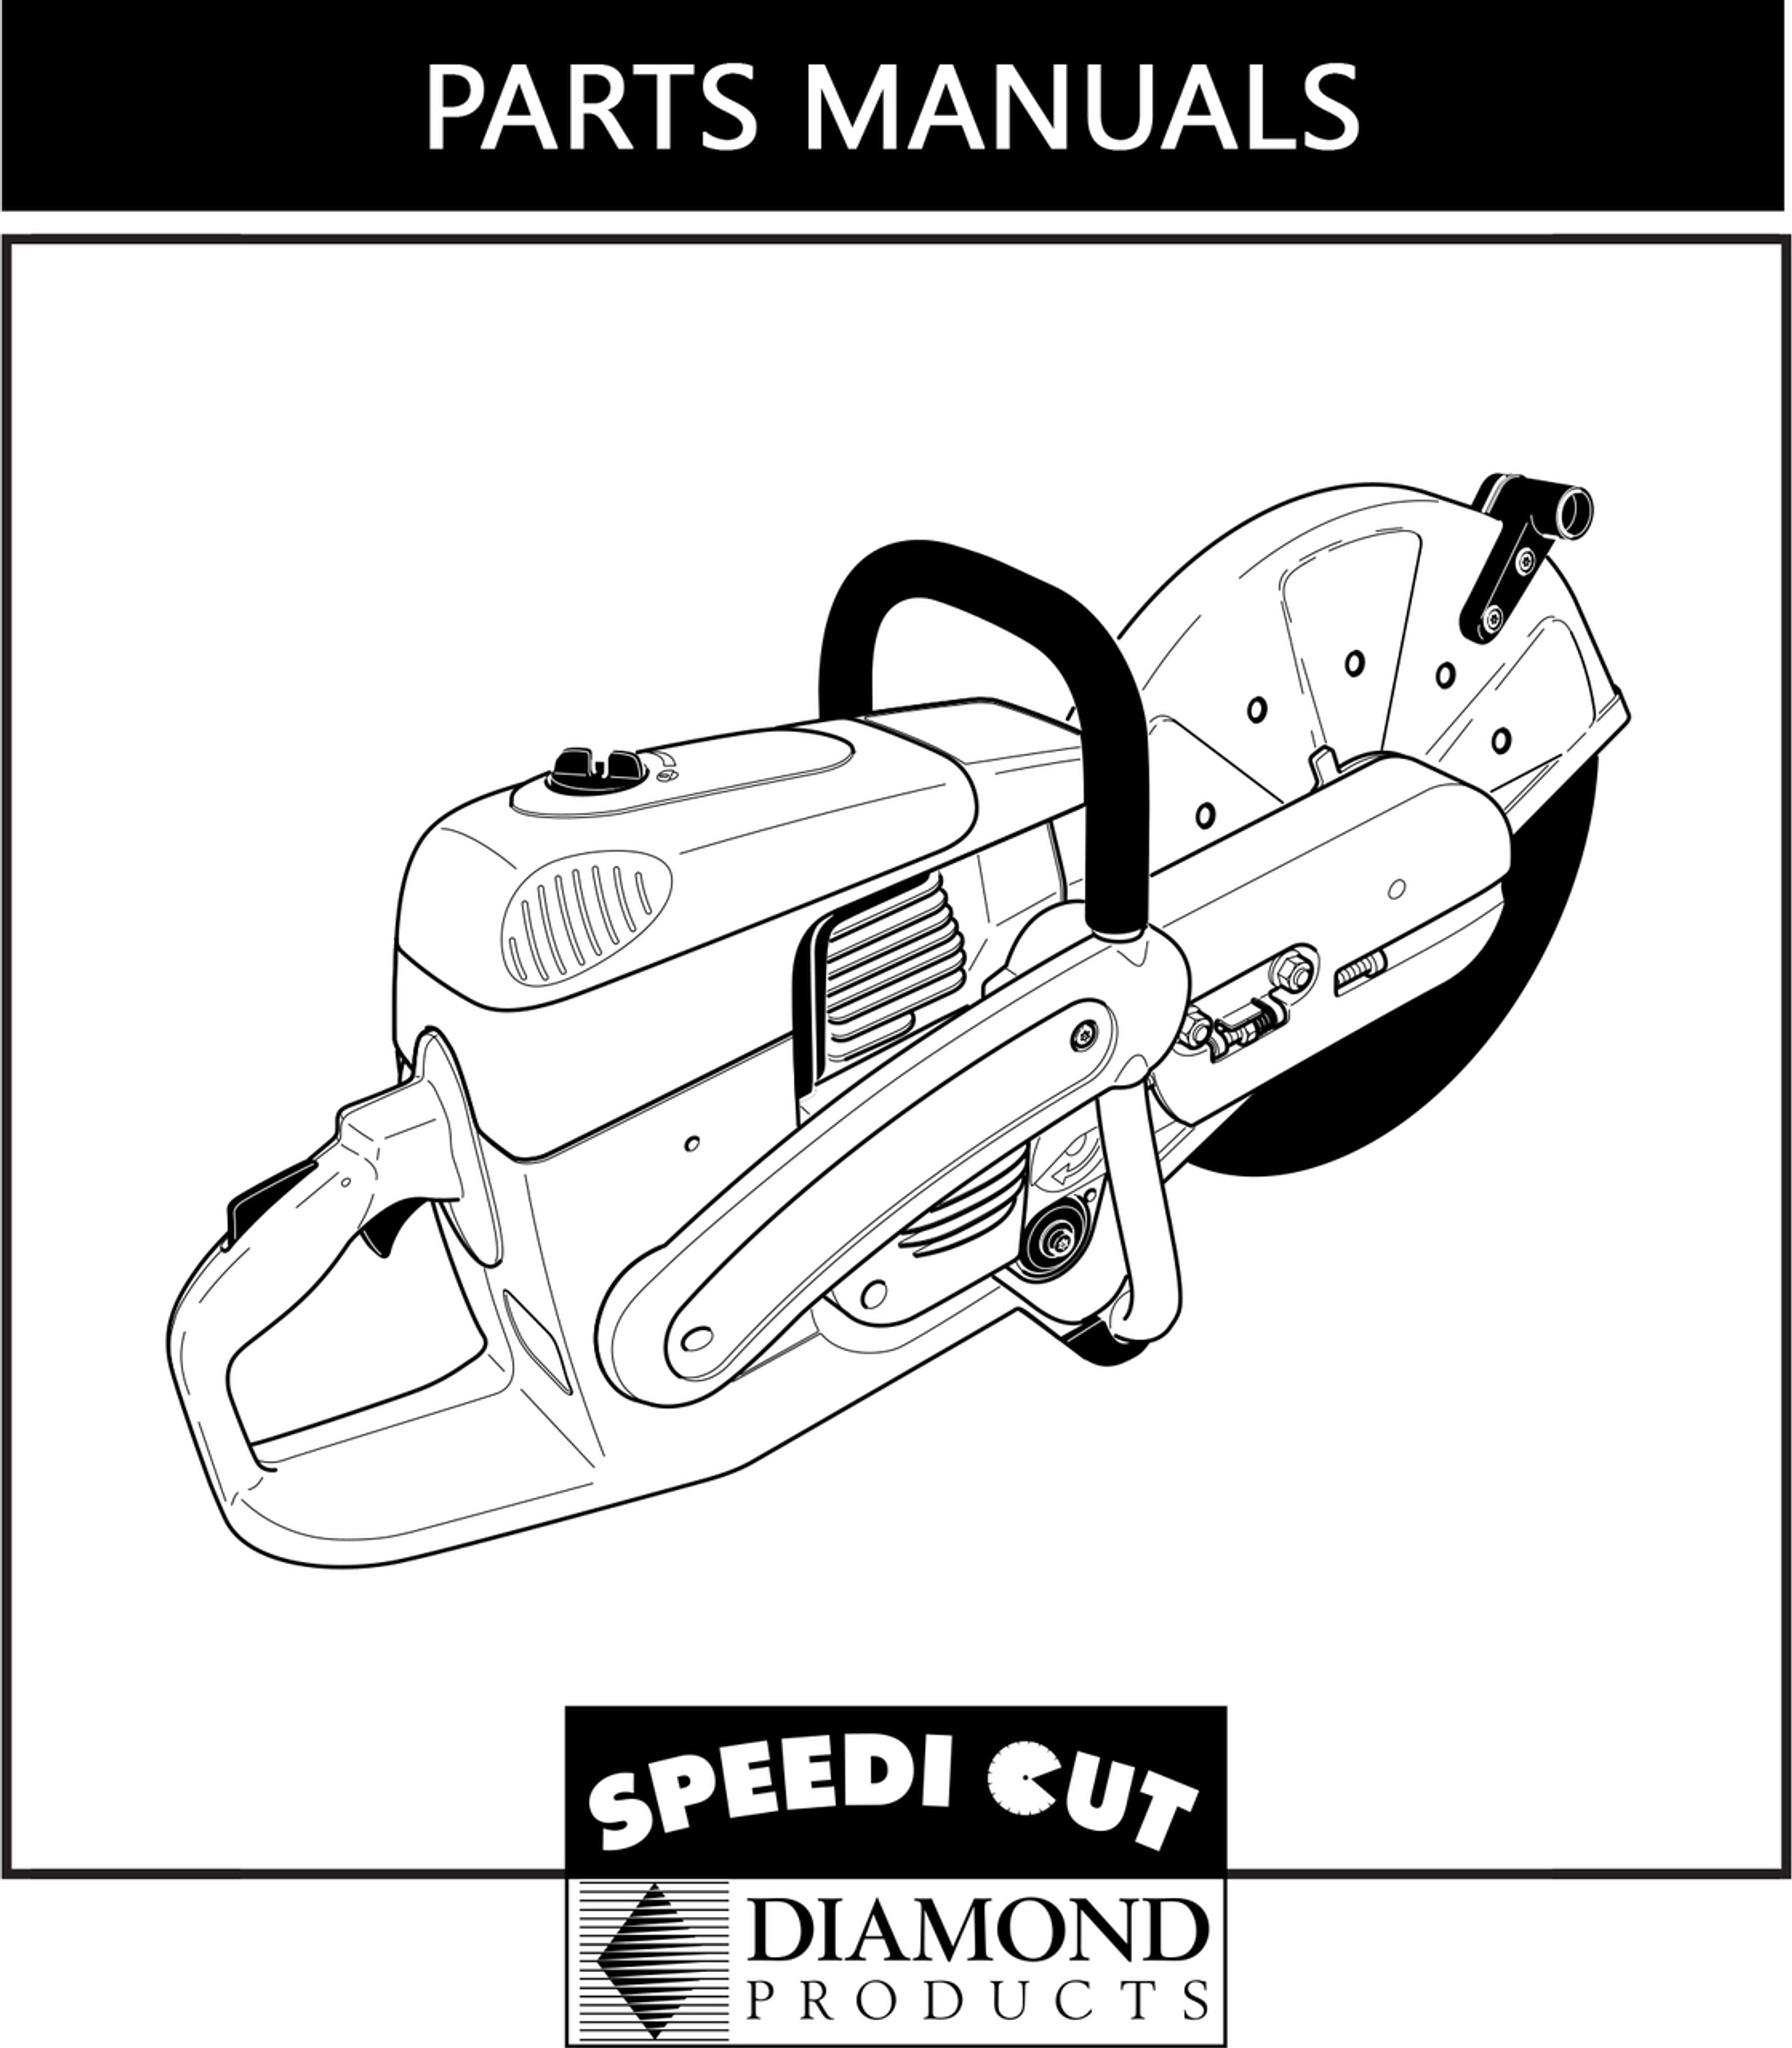 Parts manual speedicut sc7314 free download